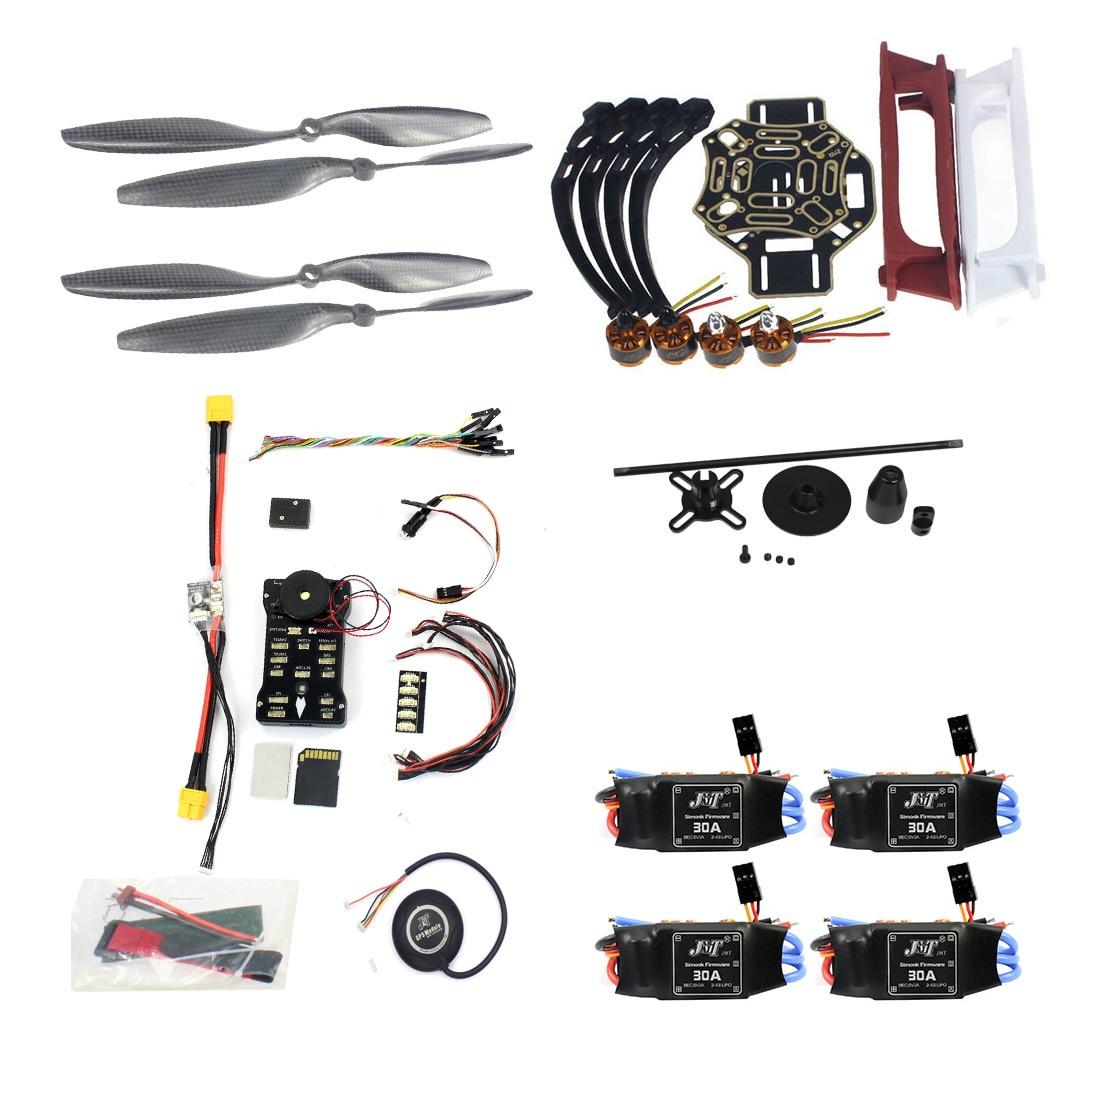 F02192-AD DIY FPV Drone Quadcopter 4-achse Aircraft Kit F450 450 Rahmen PXI PX4 Flight Control 920KV Motor GPS 1043 Propes 30A ESC